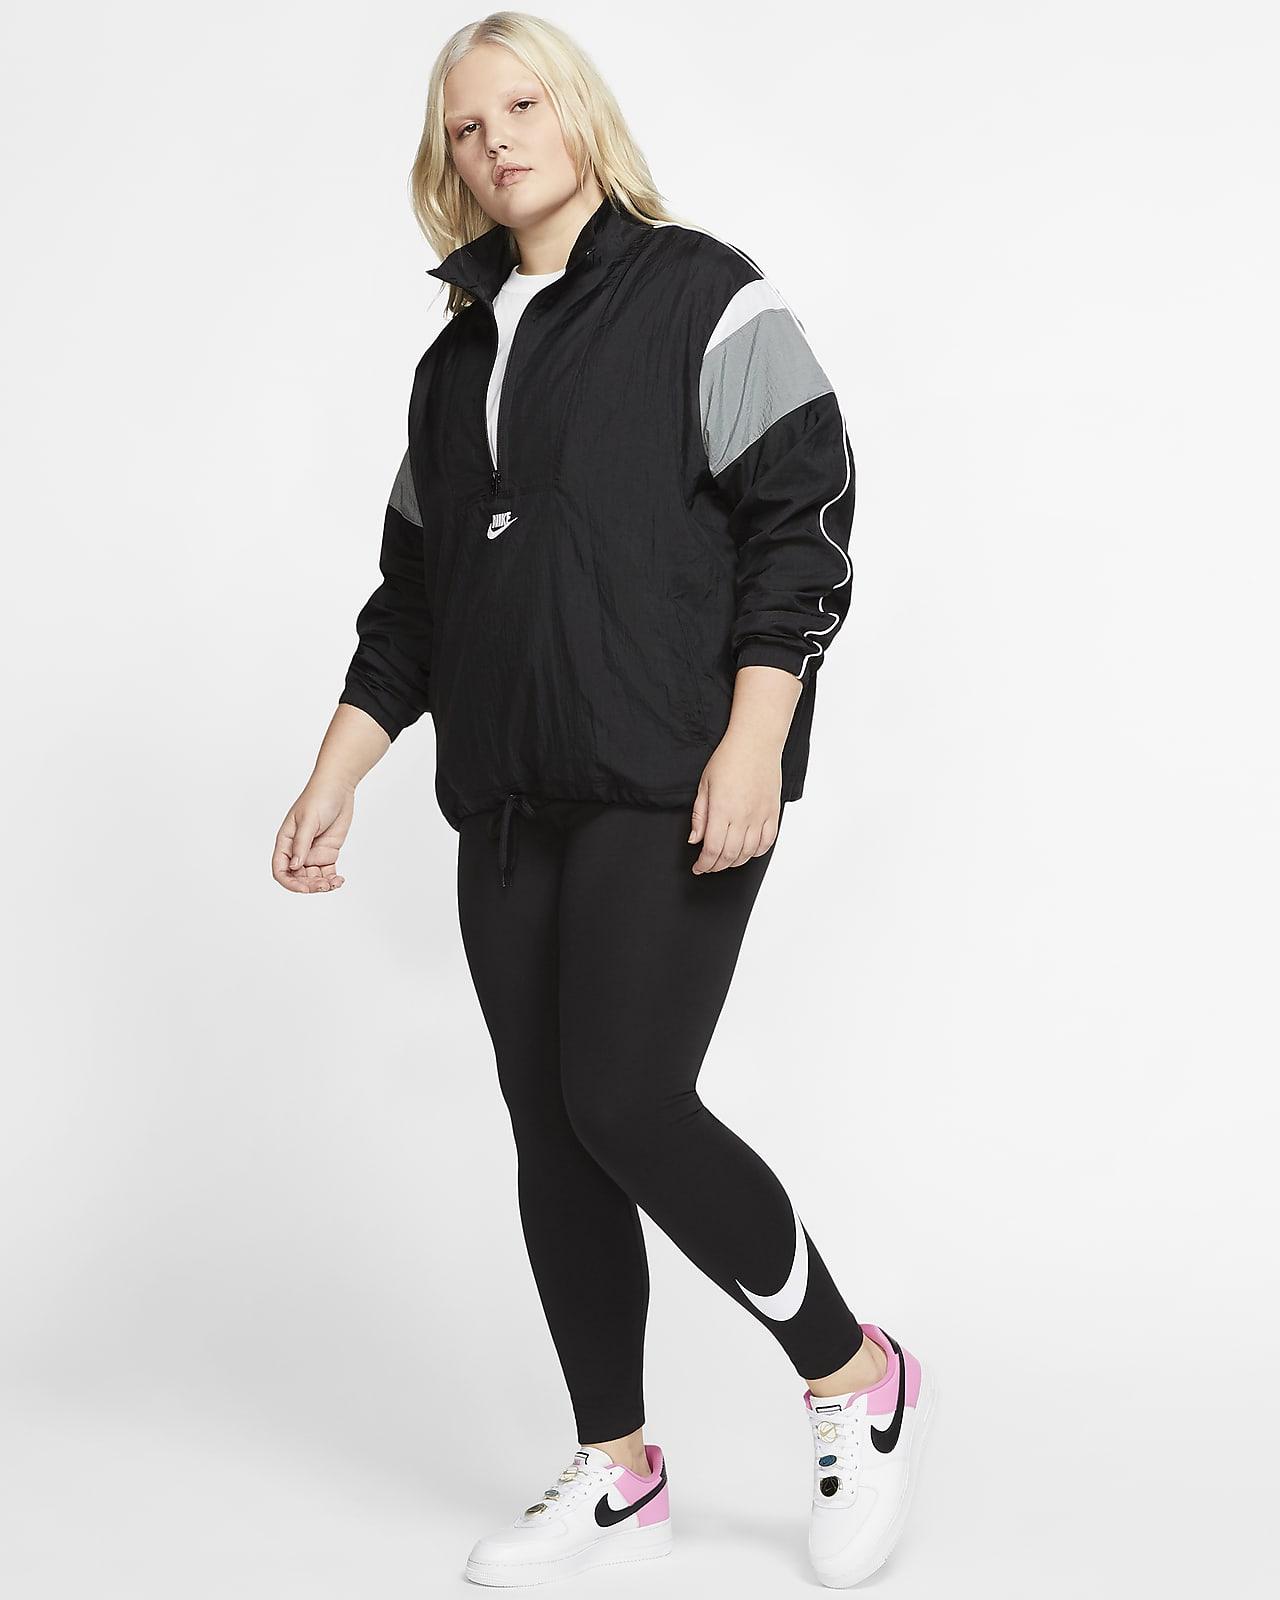 Legging taille haute Nike Sportswear Club pour Femme (grande taille)